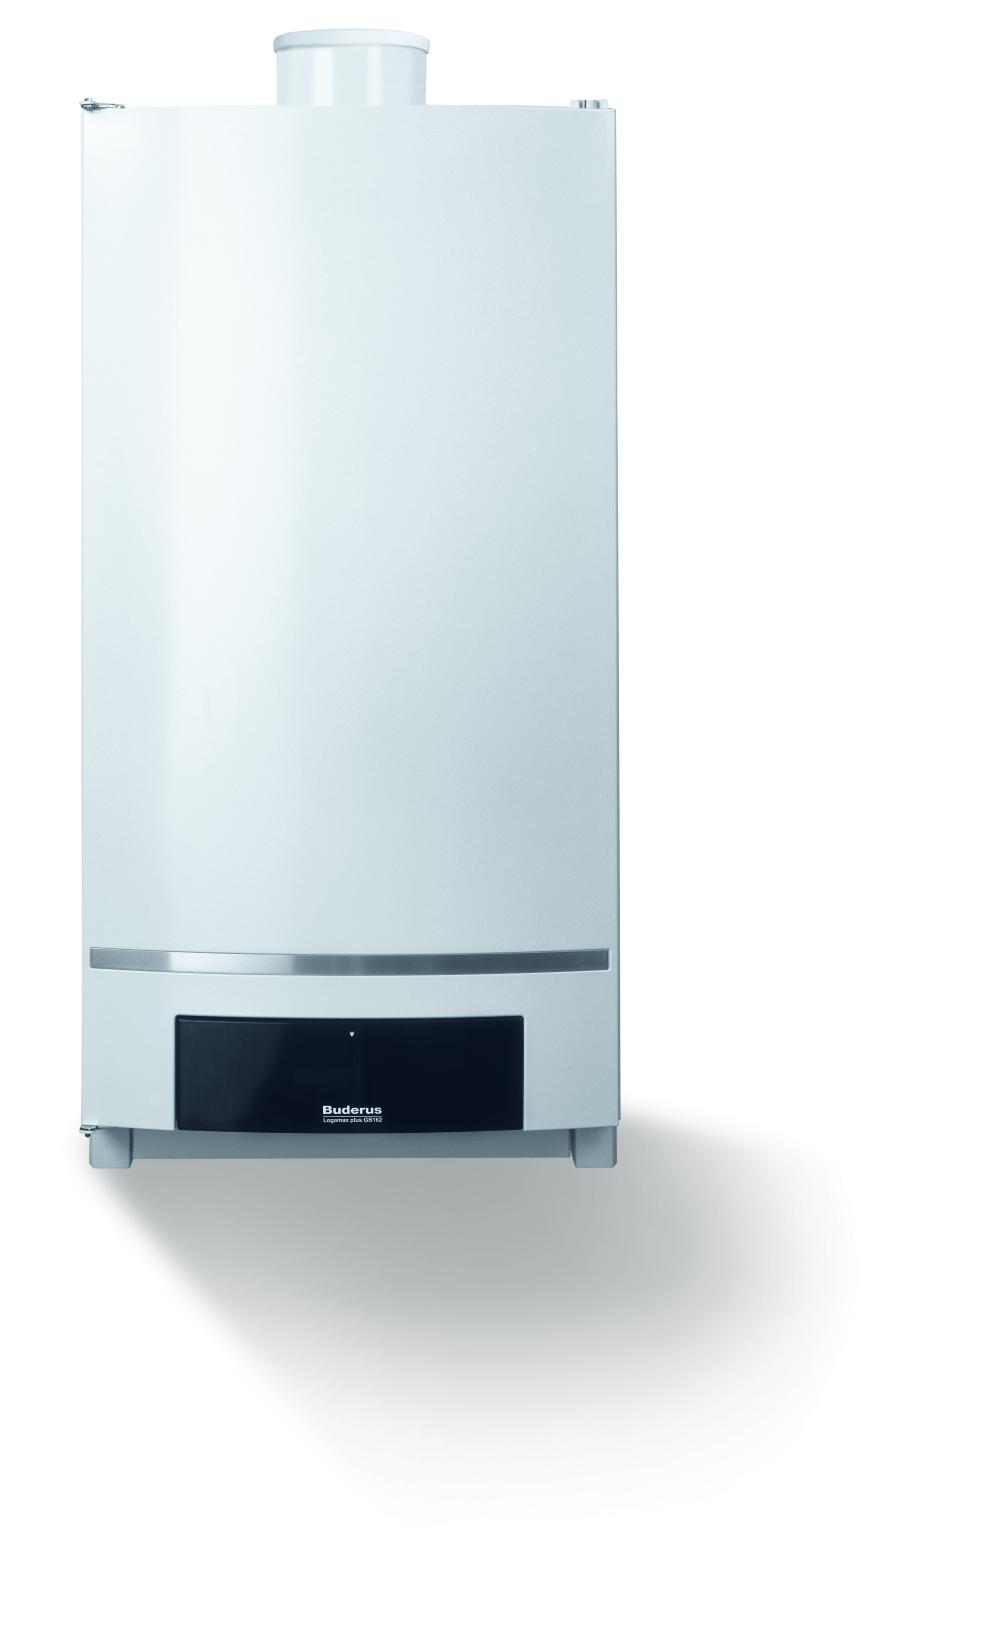 Cazan condensare GB172-35 iW H Alb